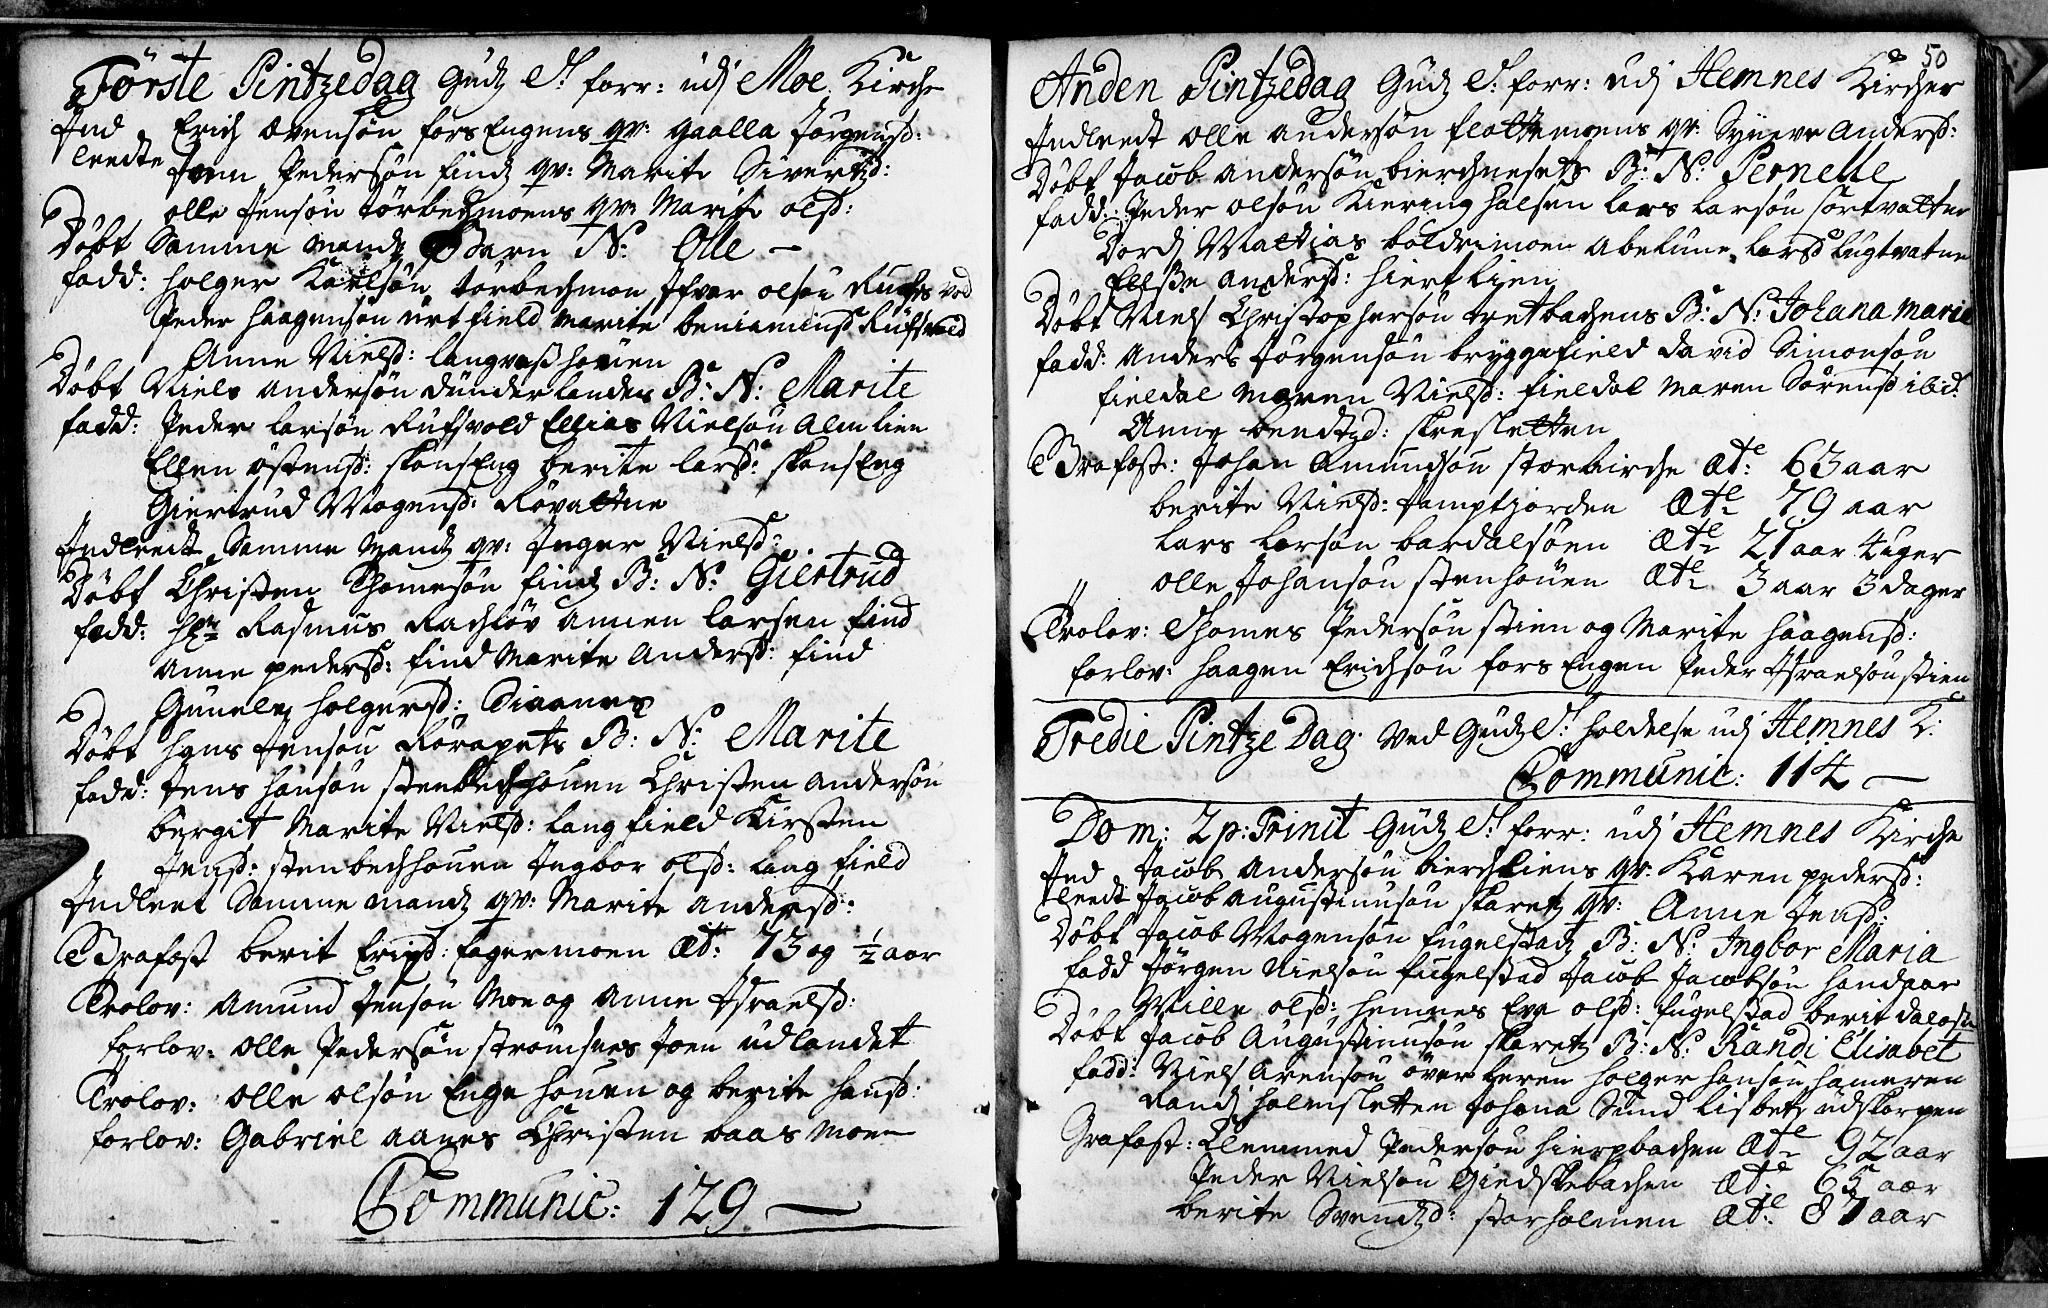 SAT, Ministerialprotokoller, klokkerbøker og fødselsregistre - Nordland, 825/L0346: Ministerialbok nr. 825A02, 1729-1748, s. 50